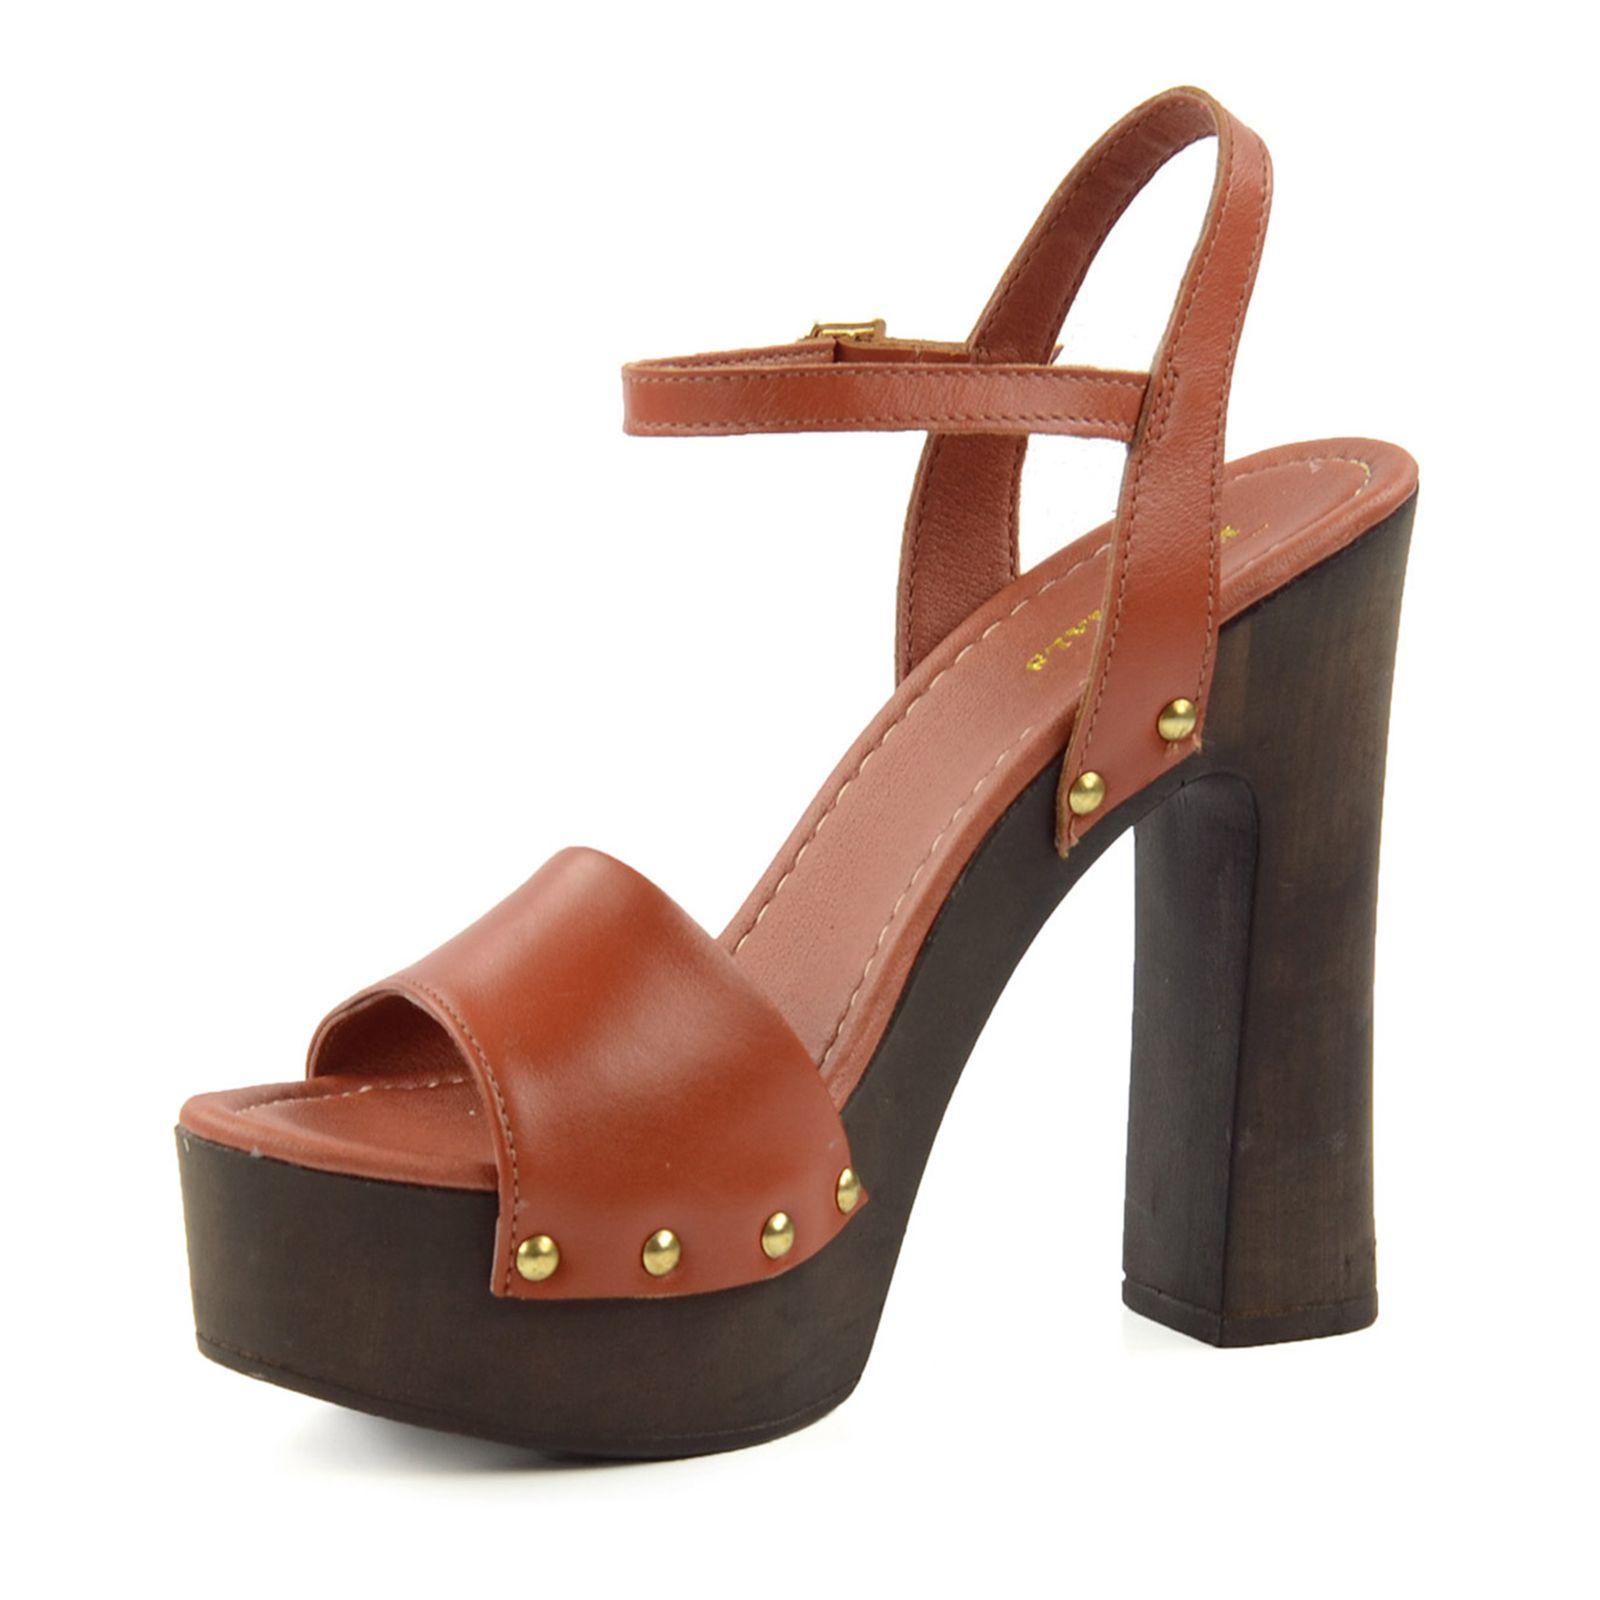 70s sandalen mit blockabsatz damenschuhe. Black Bedroom Furniture Sets. Home Design Ideas